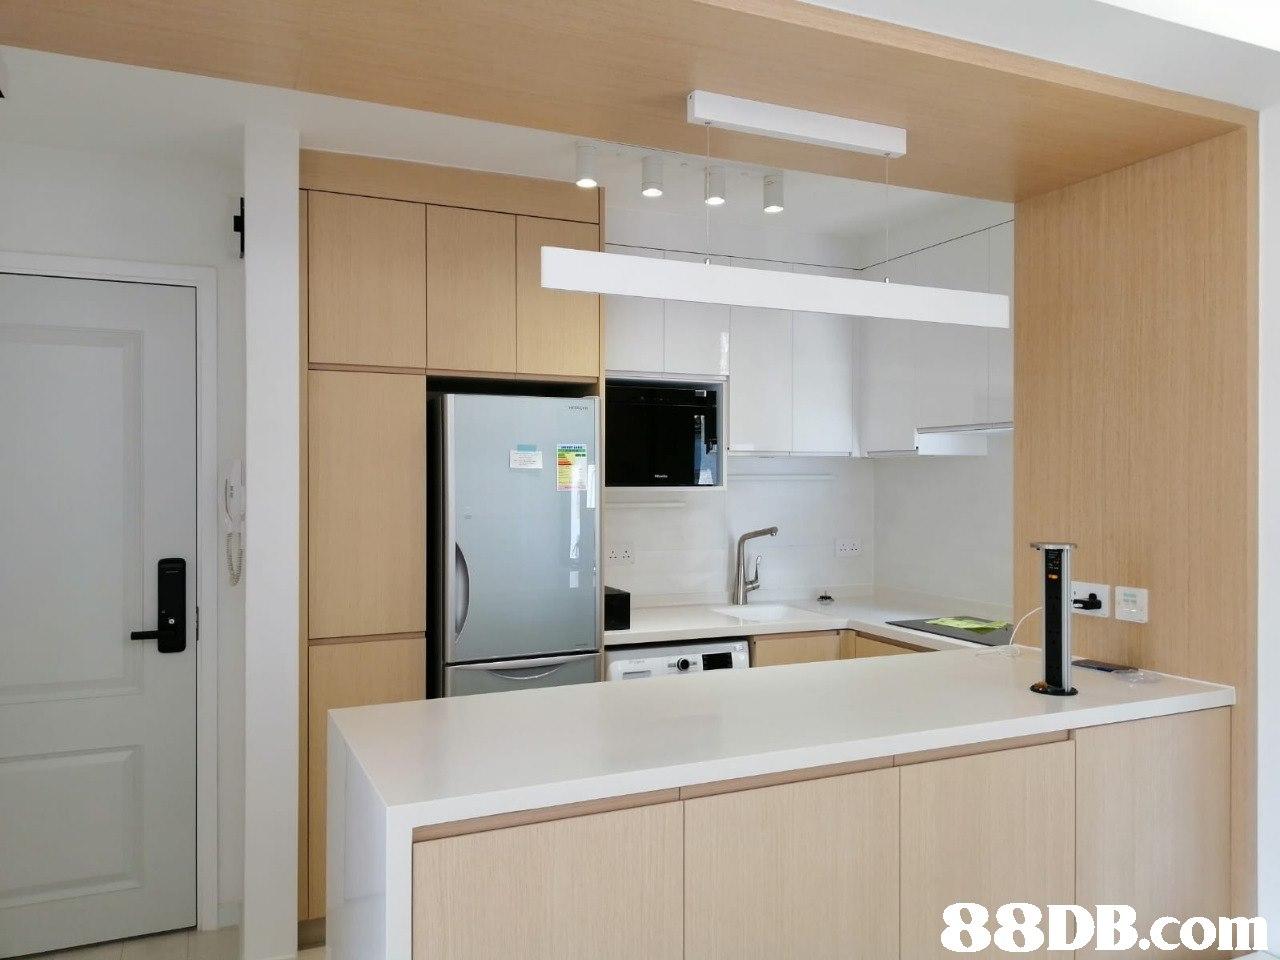 property,kitchen,countertop,cabinetry,interior design